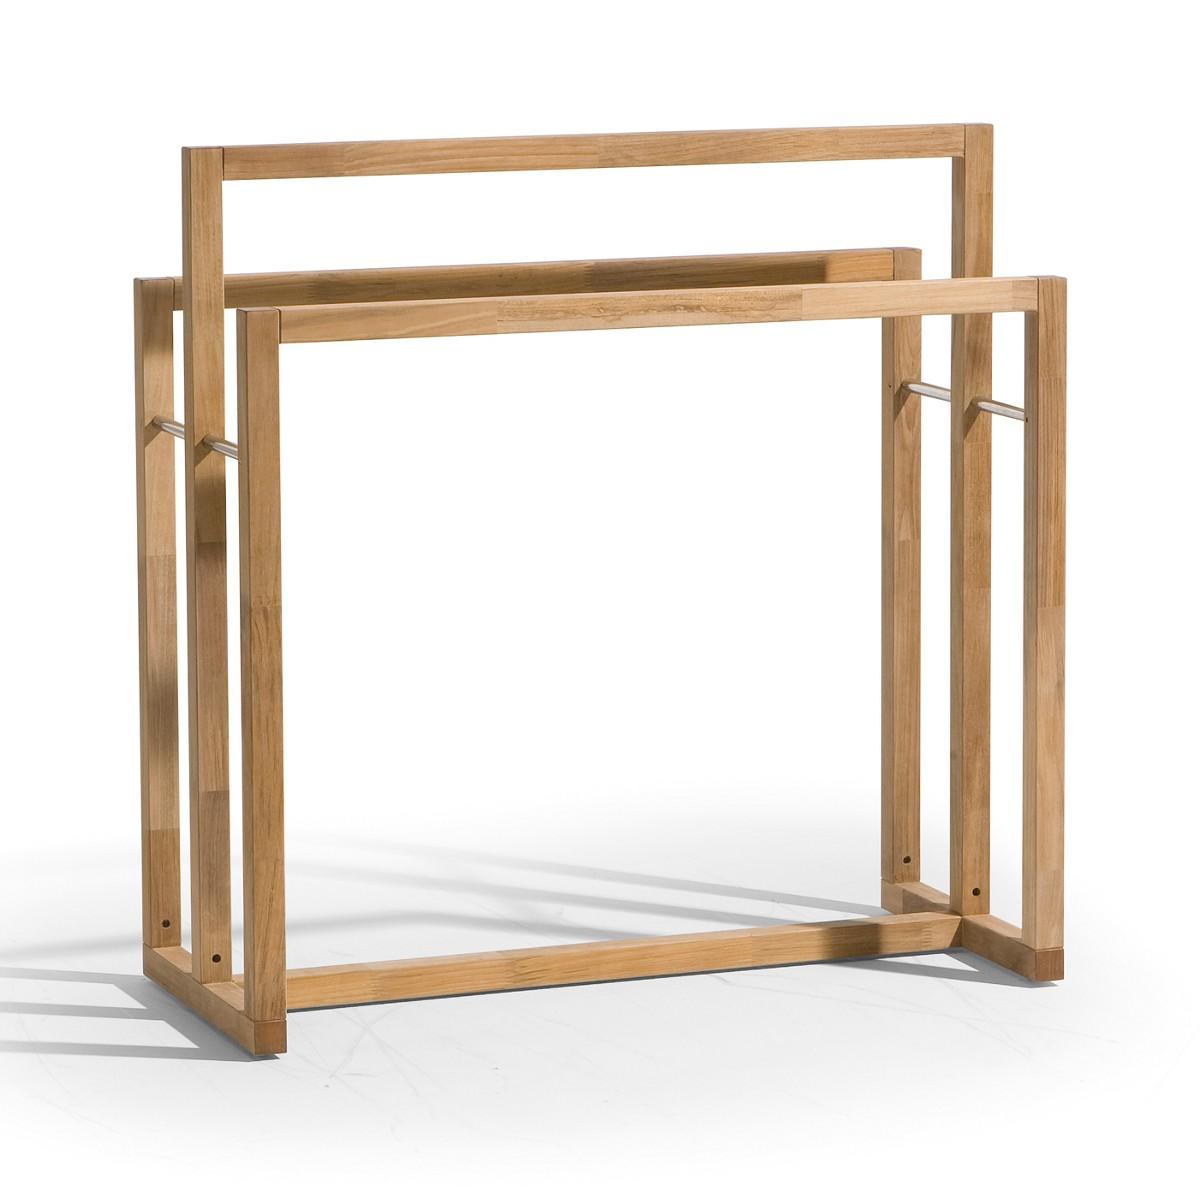 Serviettes SIENA De Manutti - Porte serviette en bois